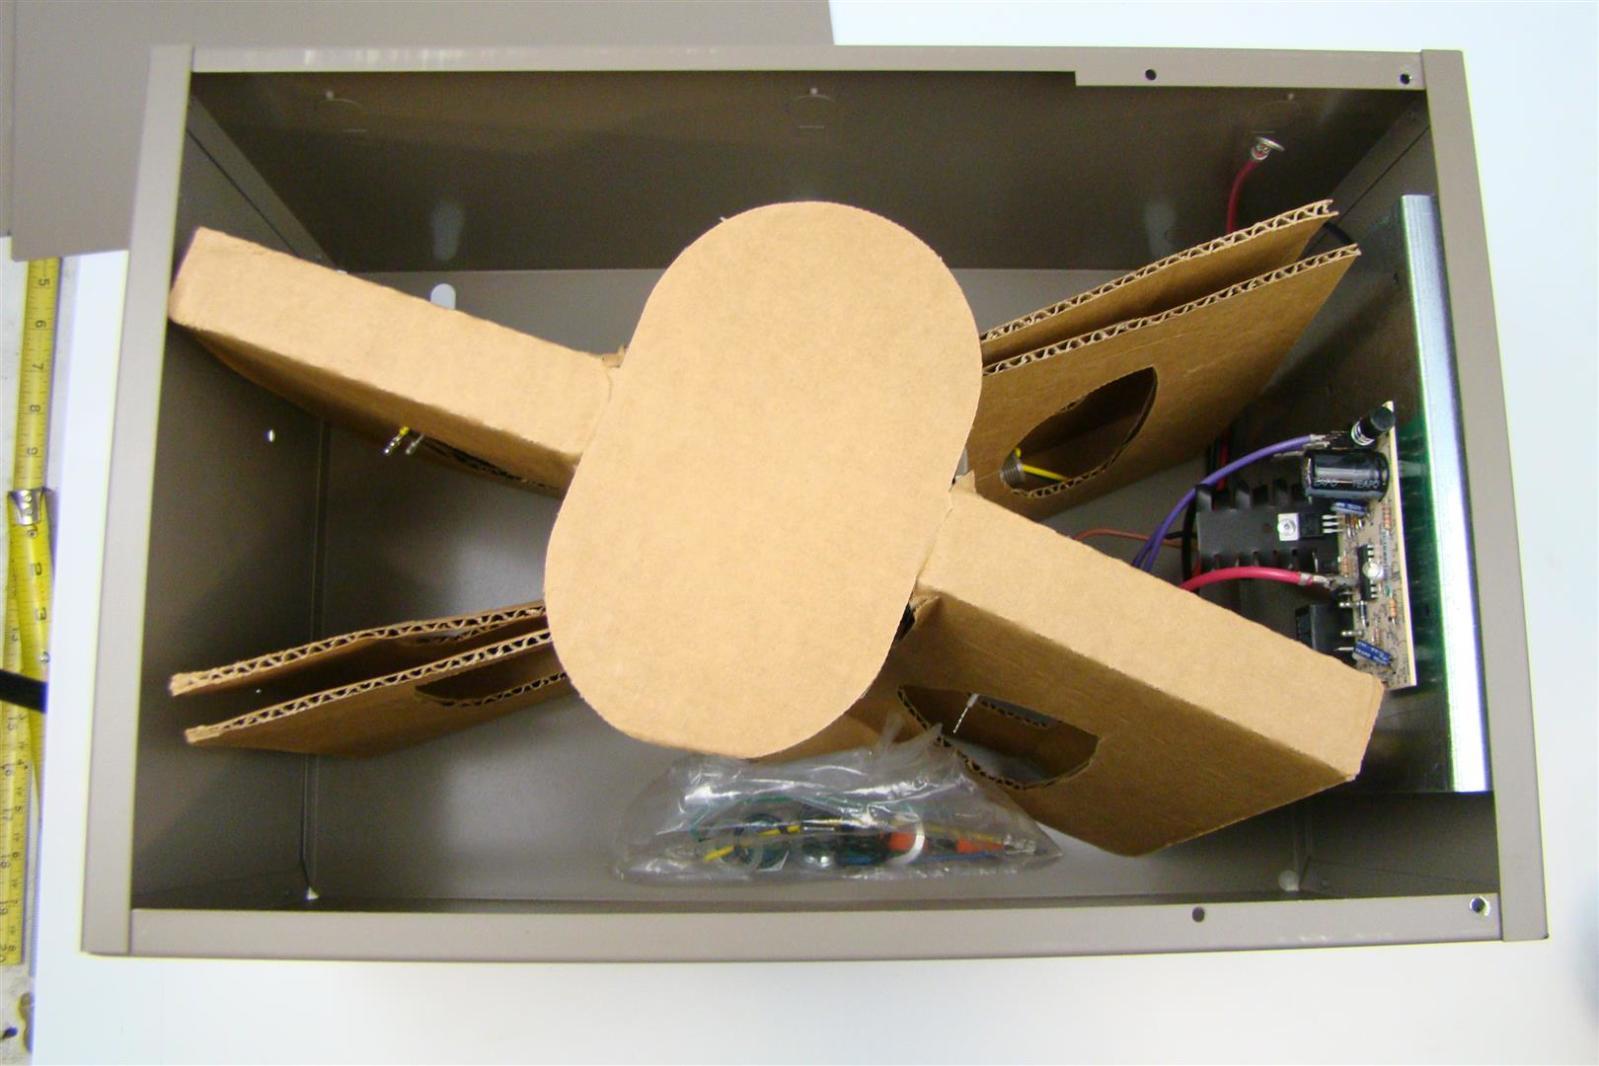 lithonia titan battery powered emergency light 125w 12v. Black Bedroom Furniture Sets. Home Design Ideas